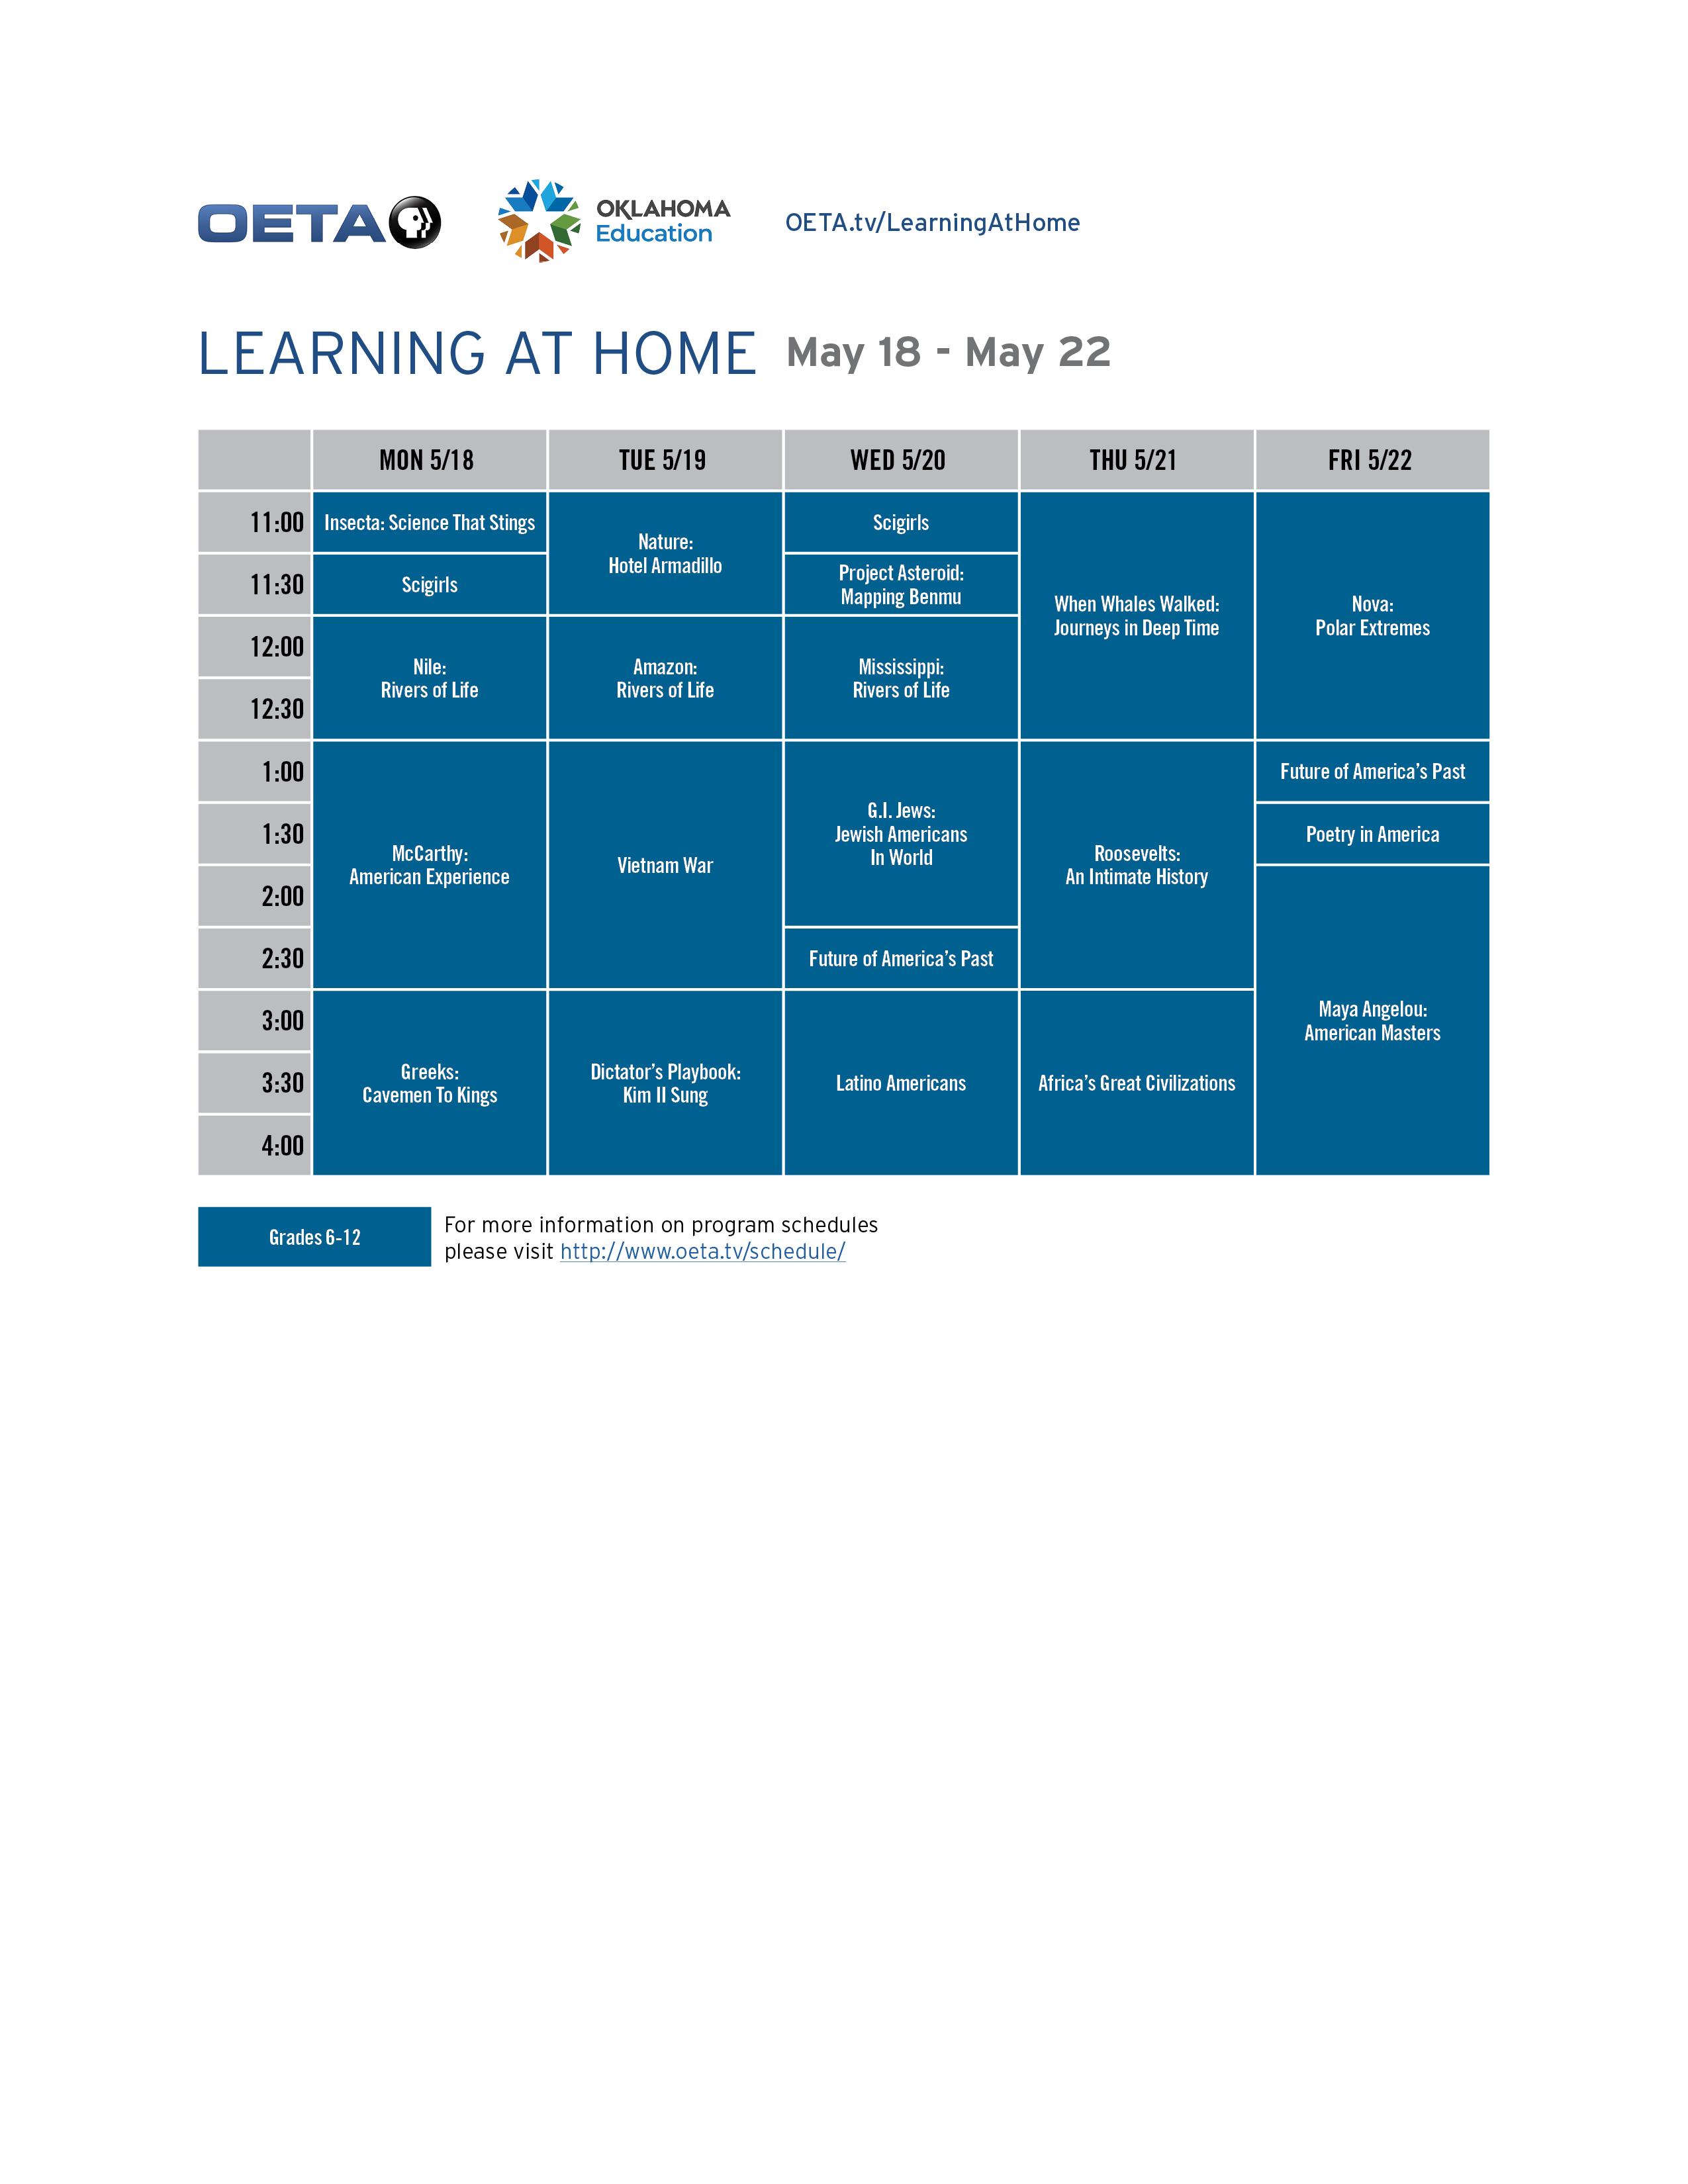 OETA WORLD Guide - April 13-17